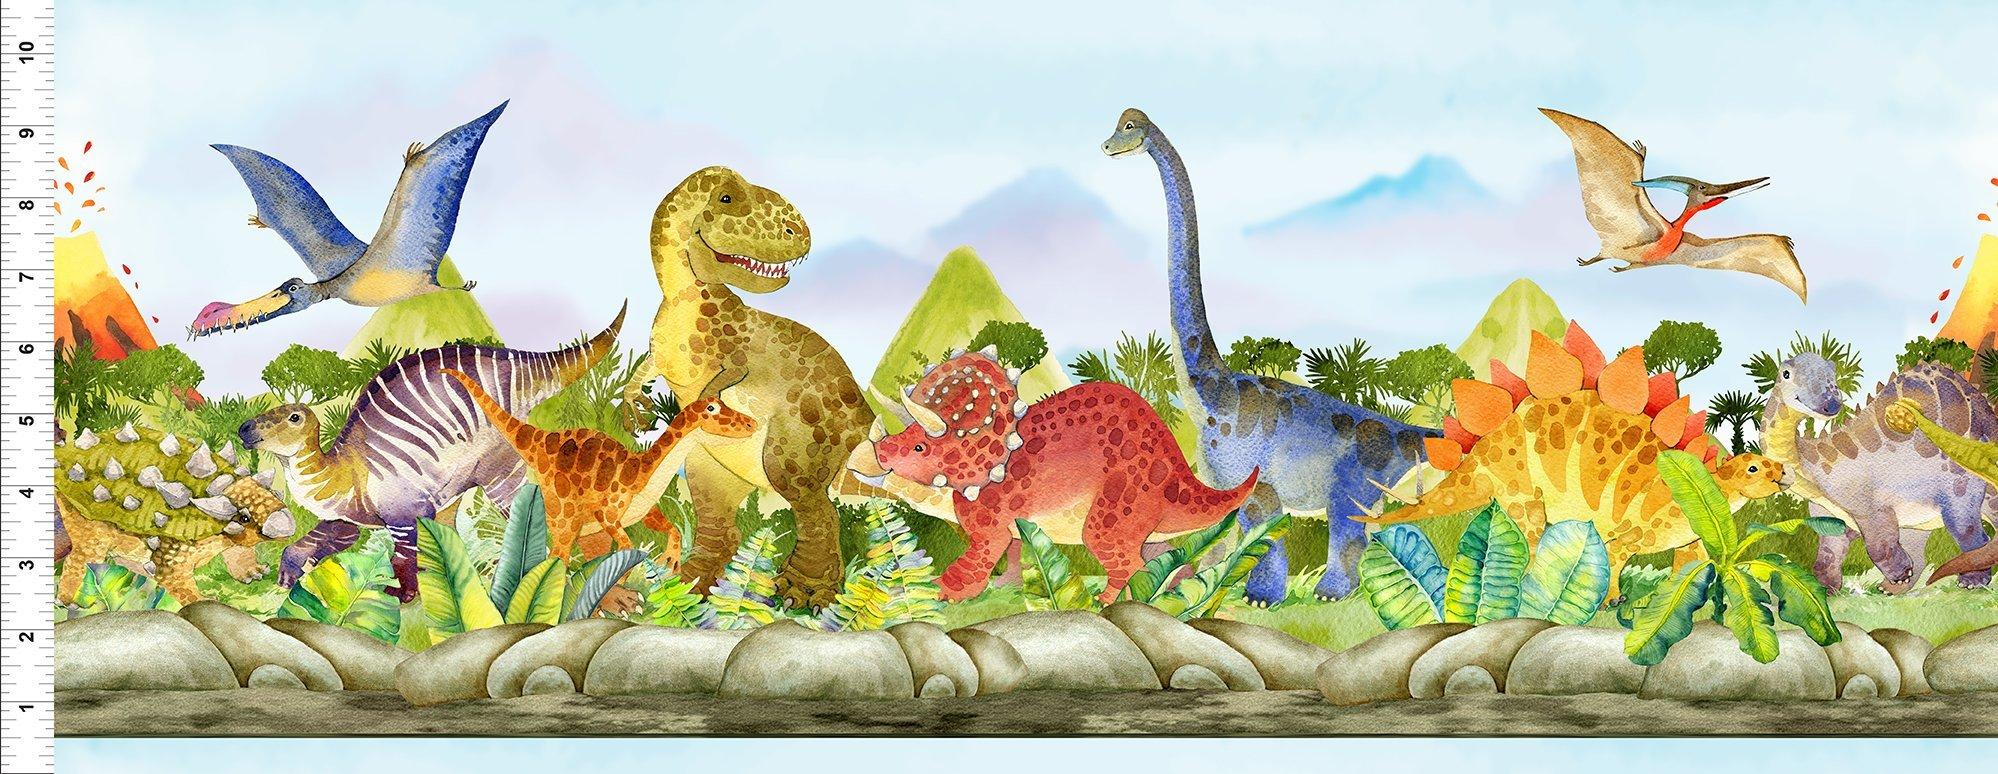 Dinosaur Friends Stripe 2DIN-1